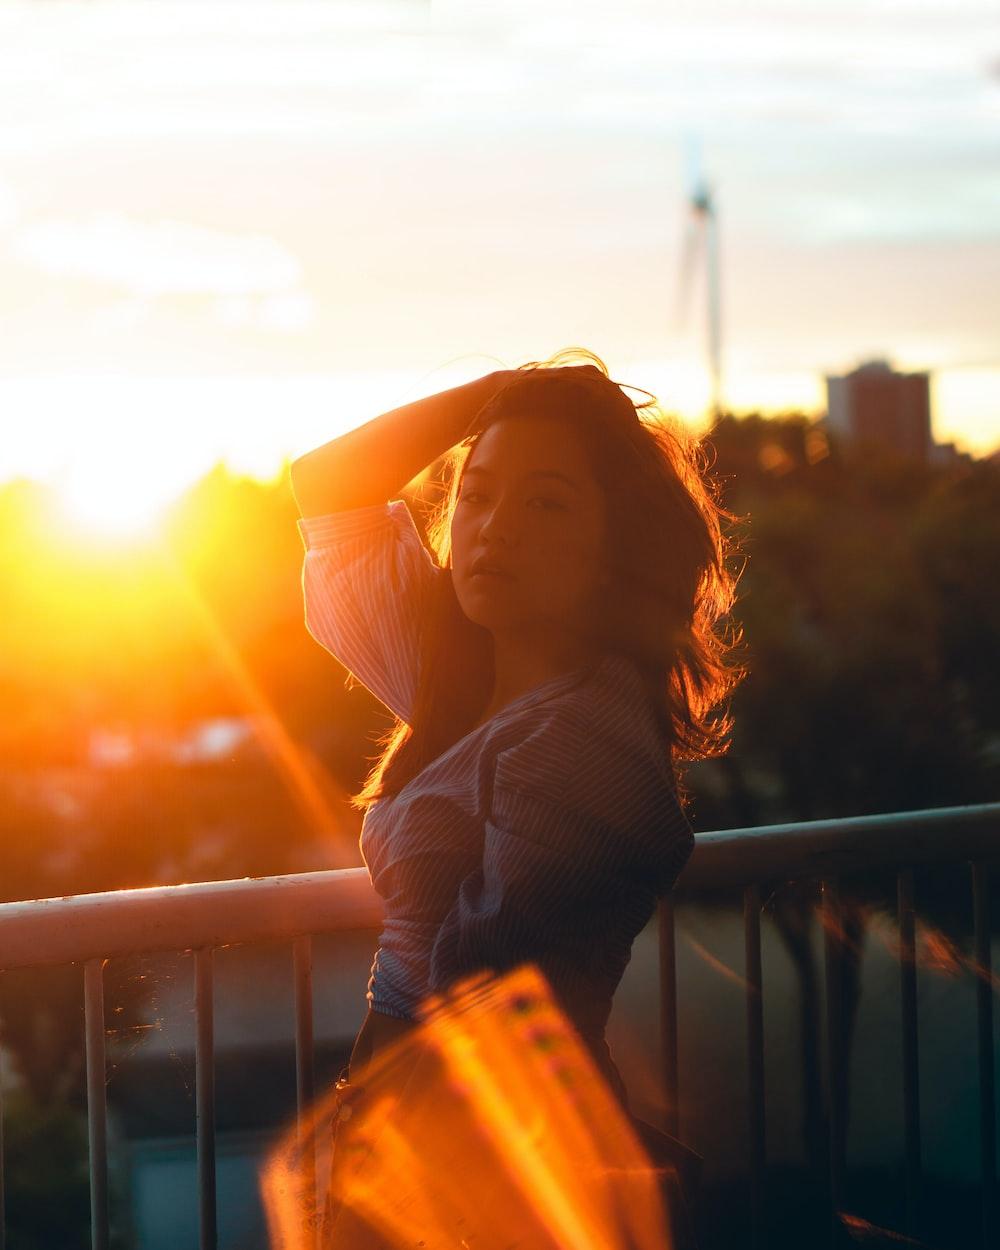 woman posing near handrail during sunset